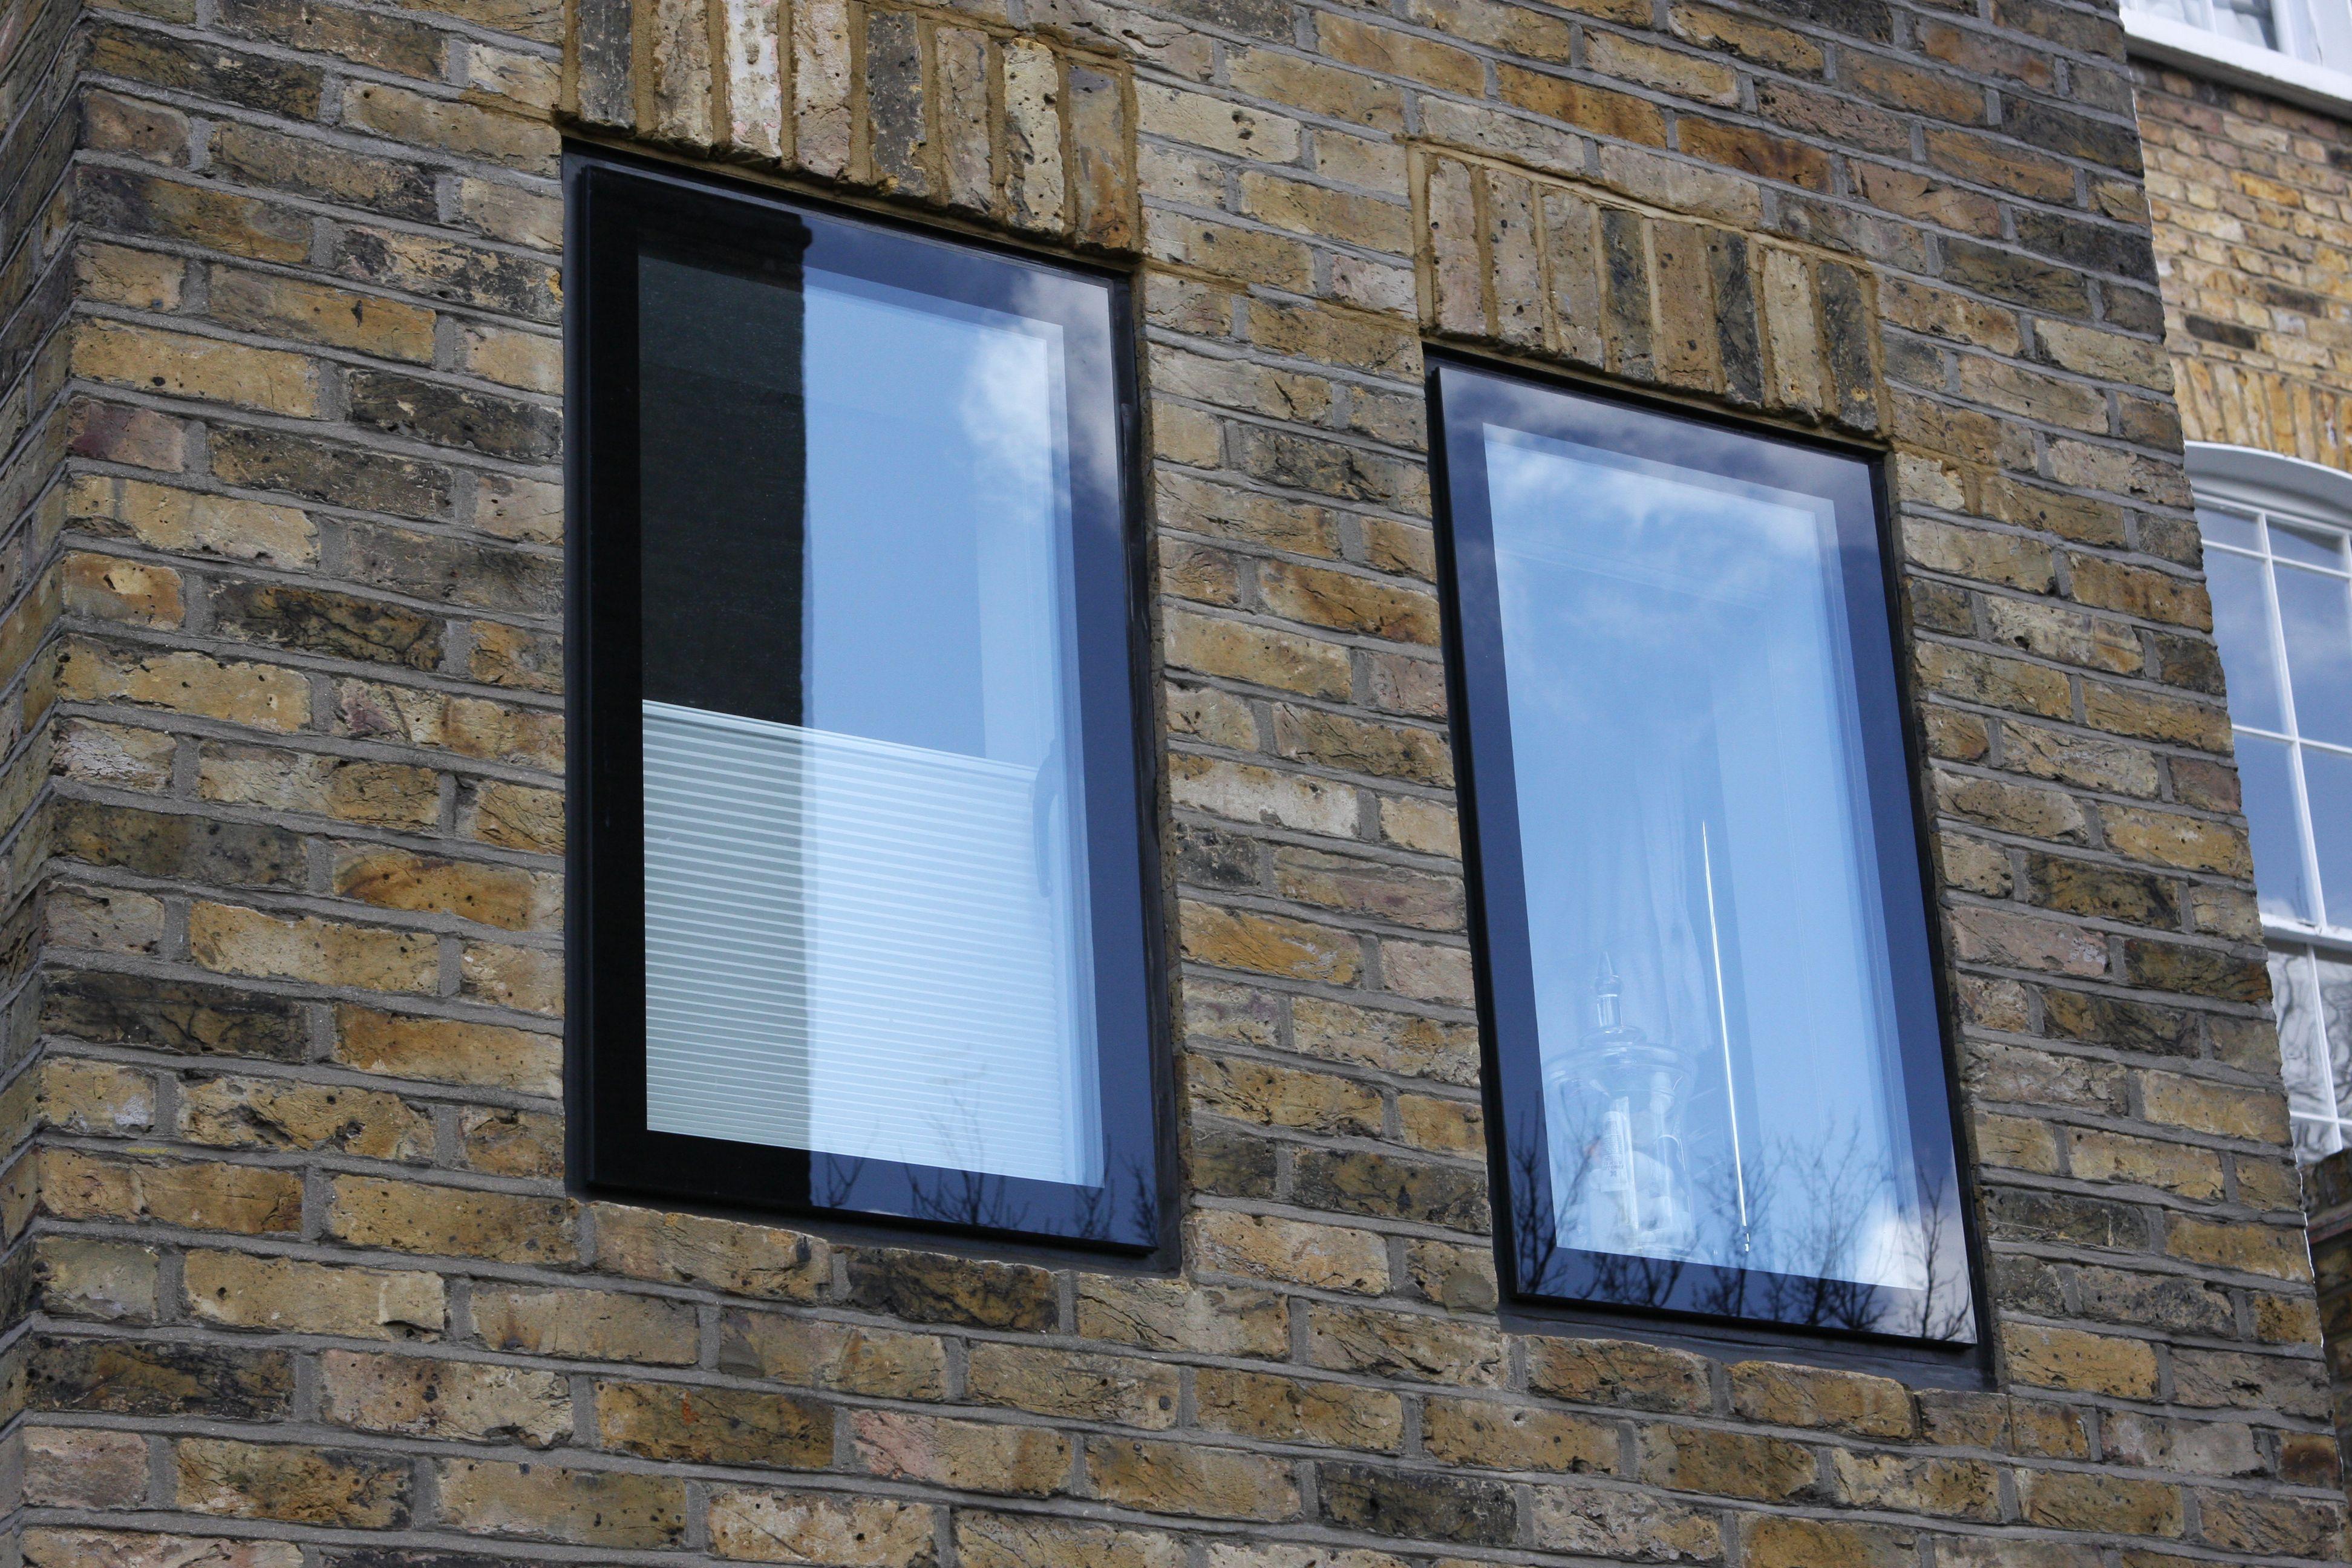 Glass Block Windows And Mixing Block Sizes Ventanas De Bloques De Vidrio Ladrillos De Vidrio Jarron Cuadrado De Cristal